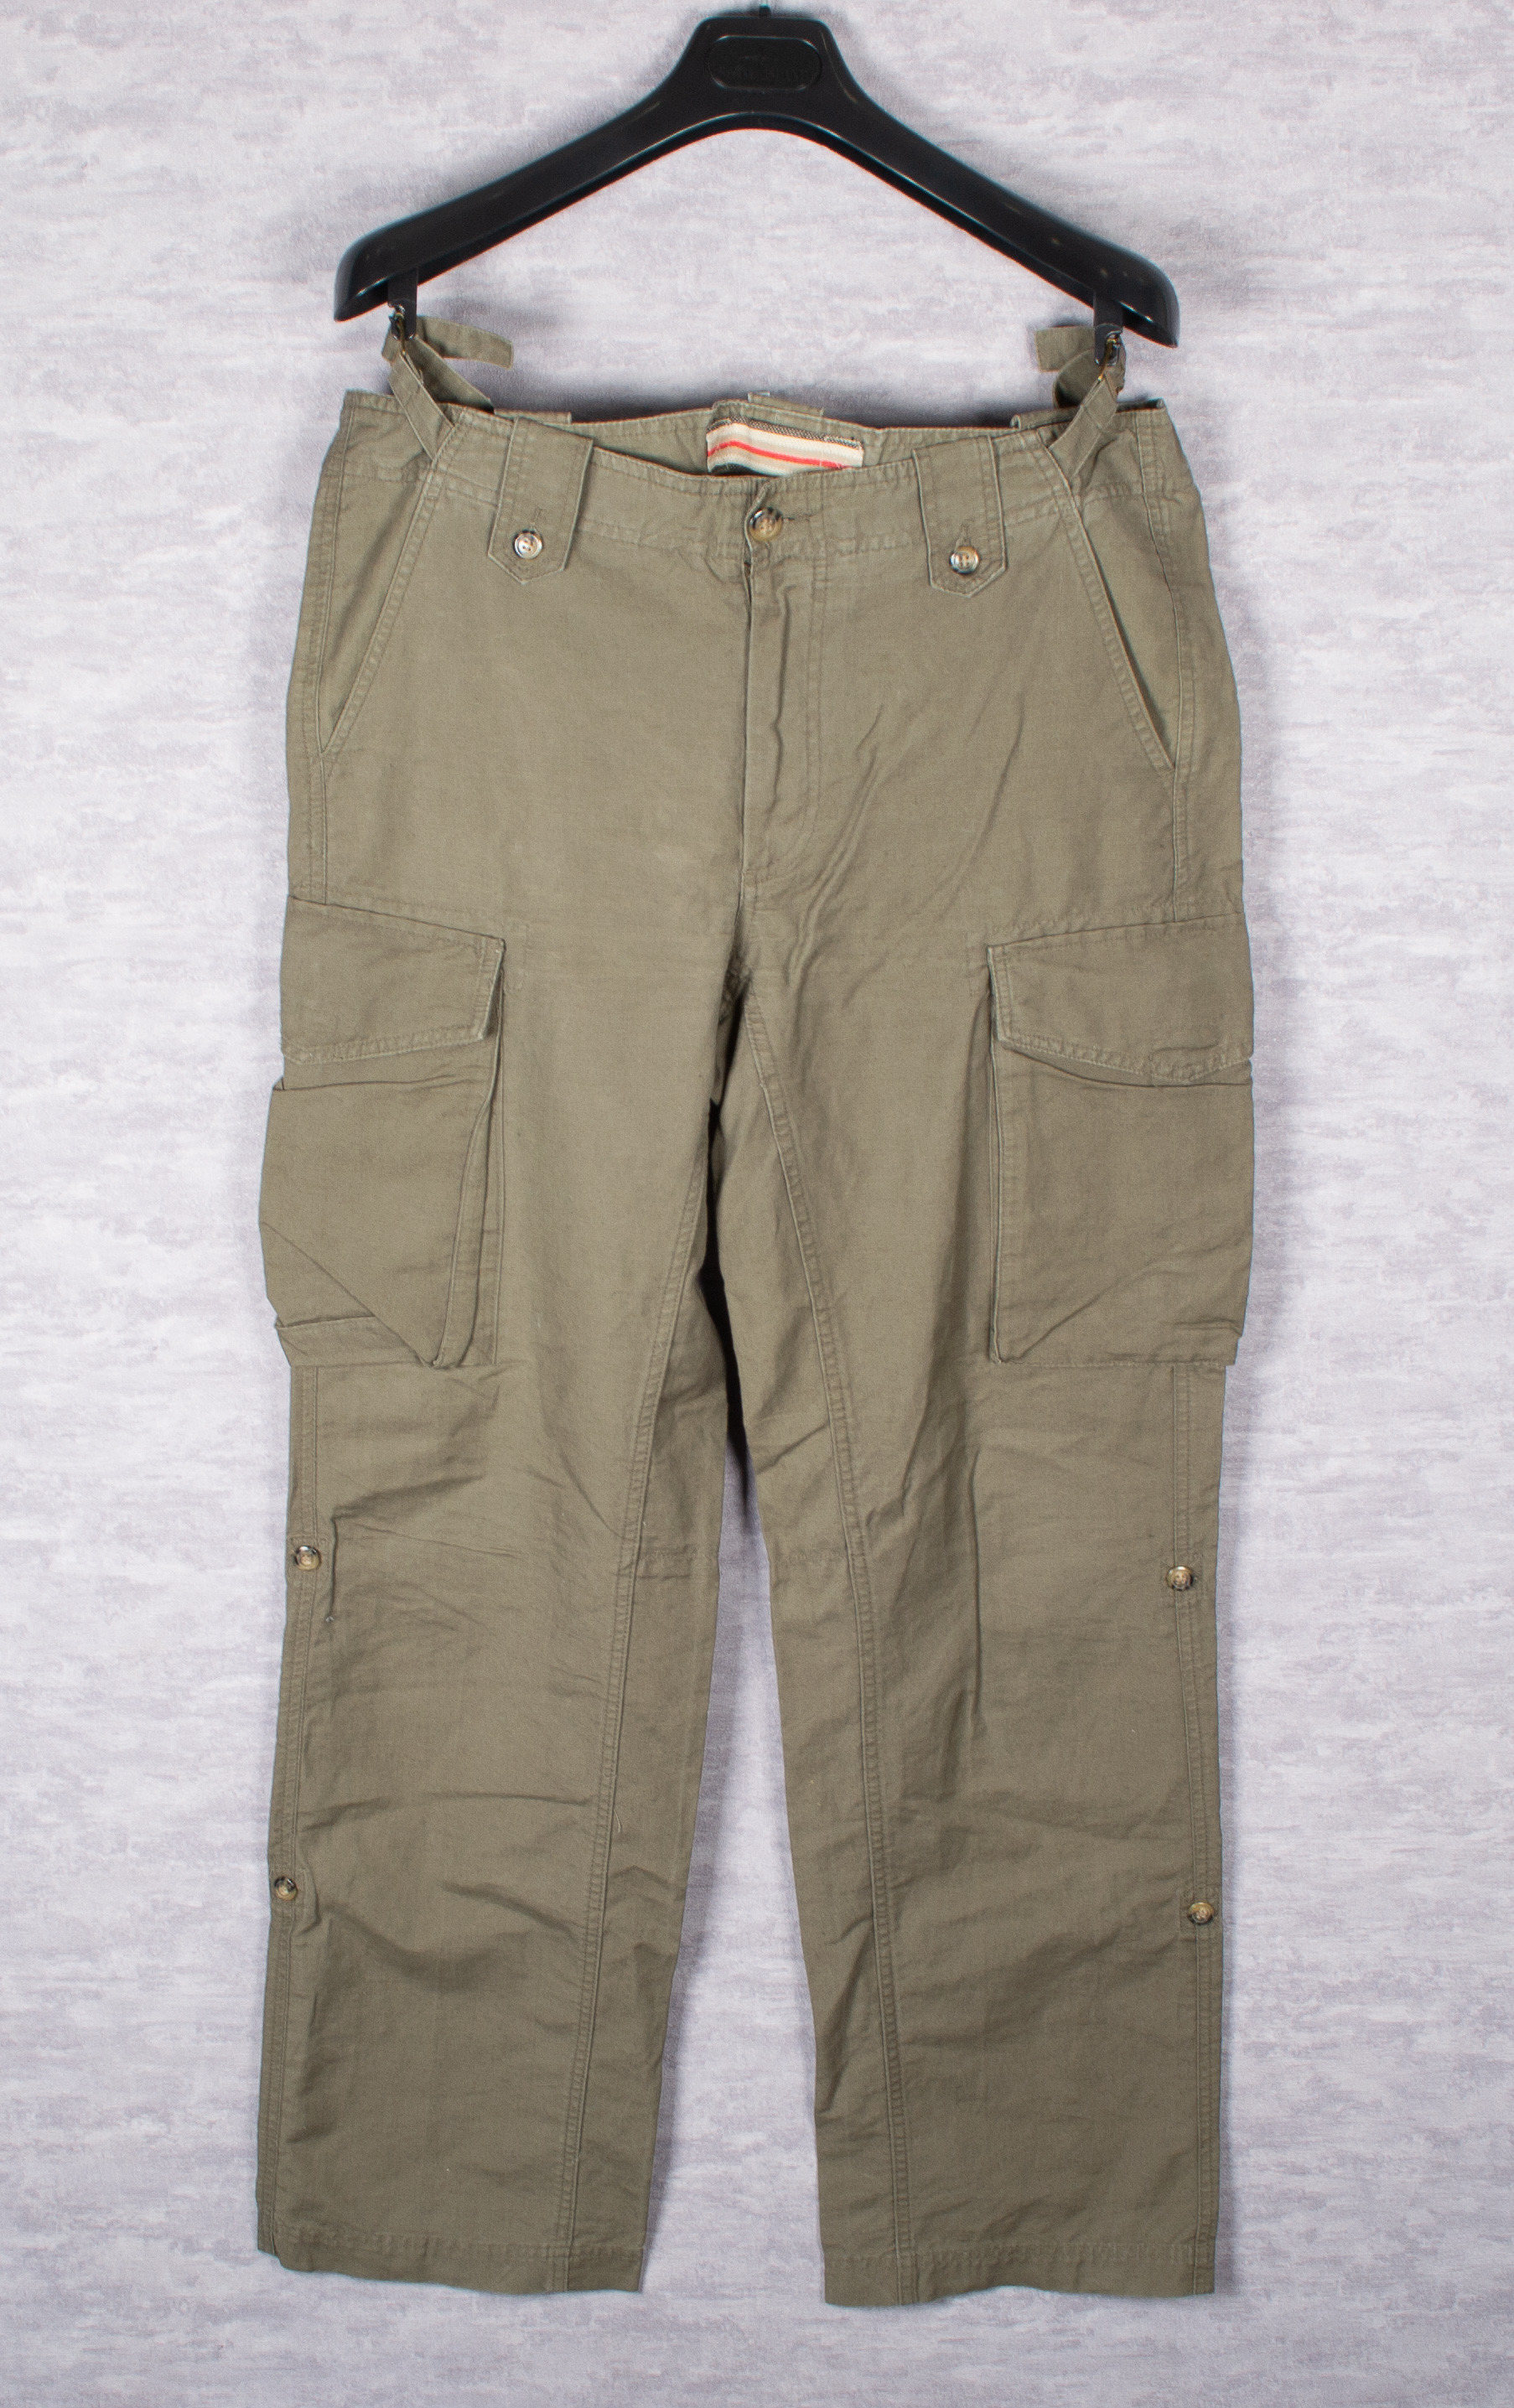 0805f07a34 Burberry ×. military khaki cargo pants. Size: US 36 / EU 52